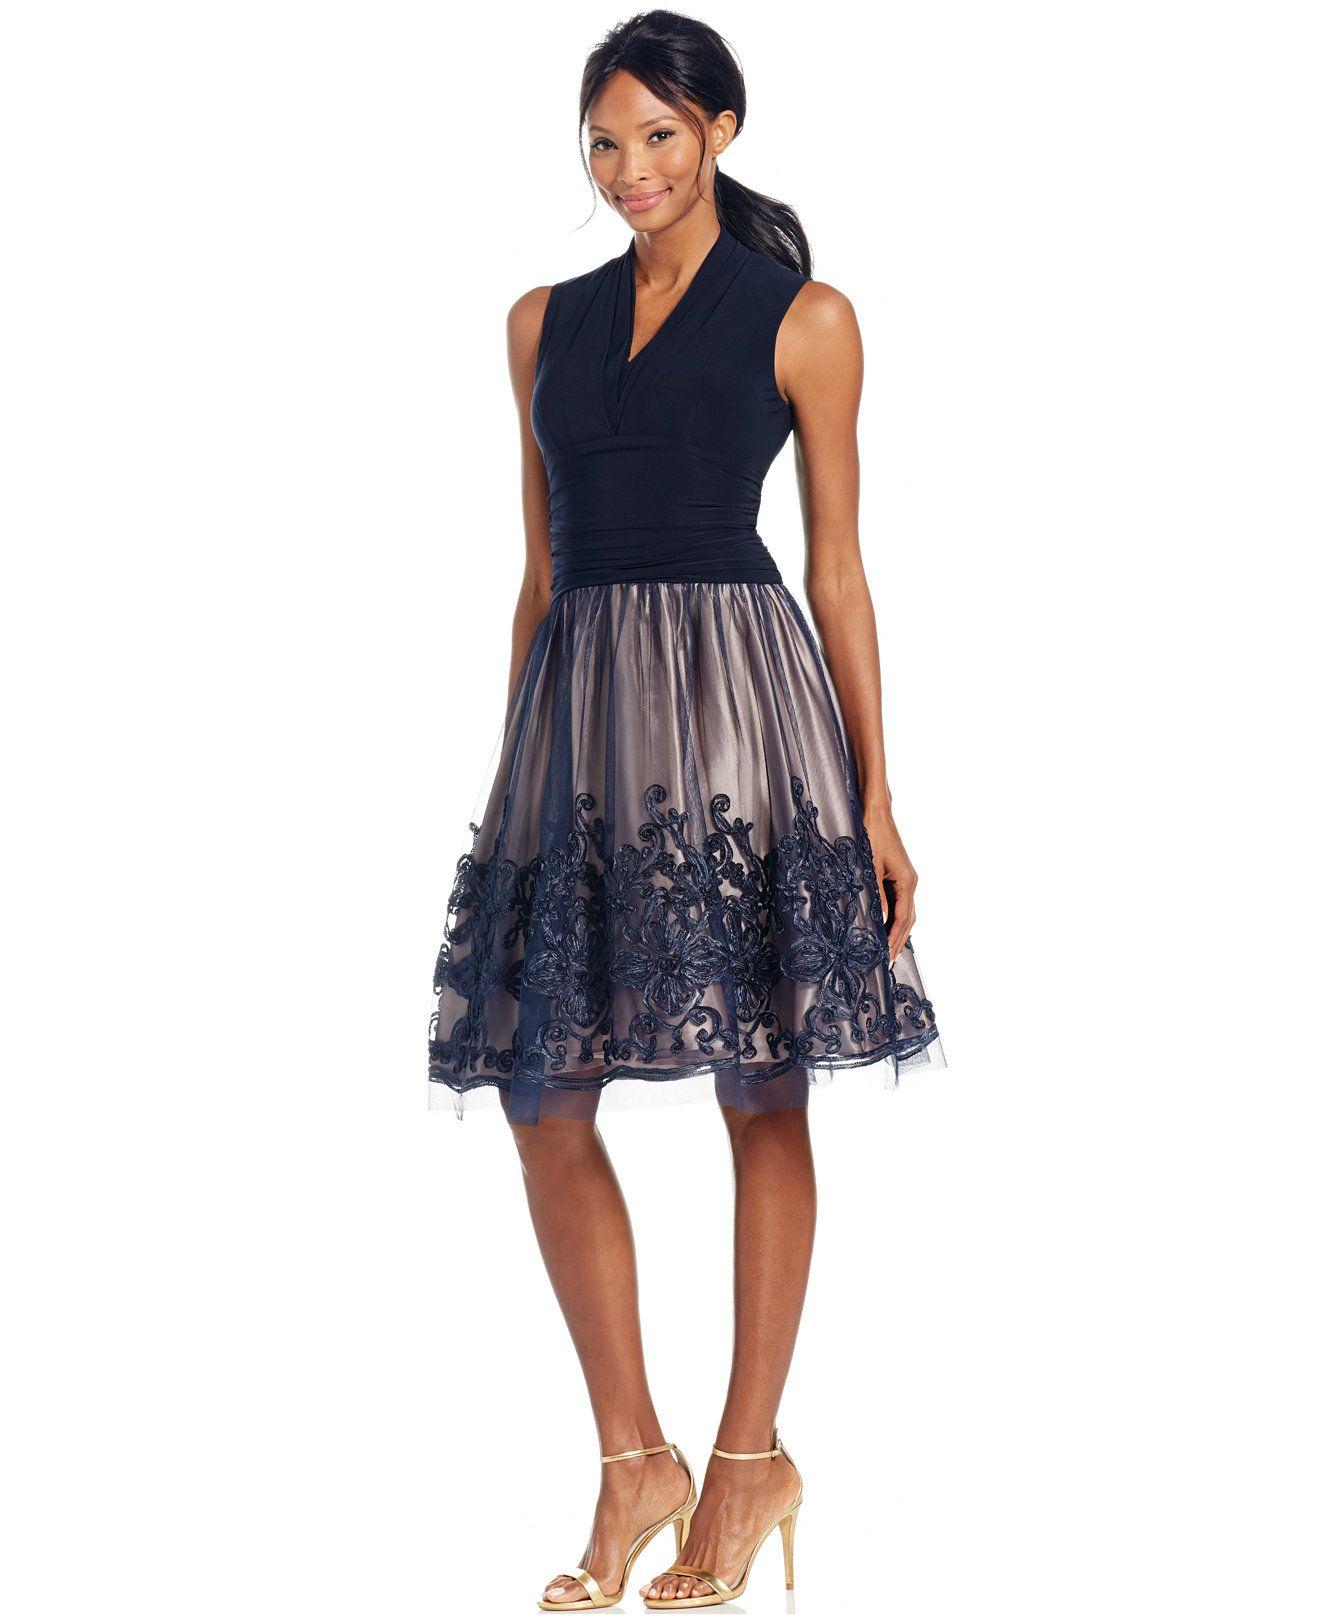 Sl sl fashion dresses - Sl Fashions Illusion Soutache Trim Party Dress